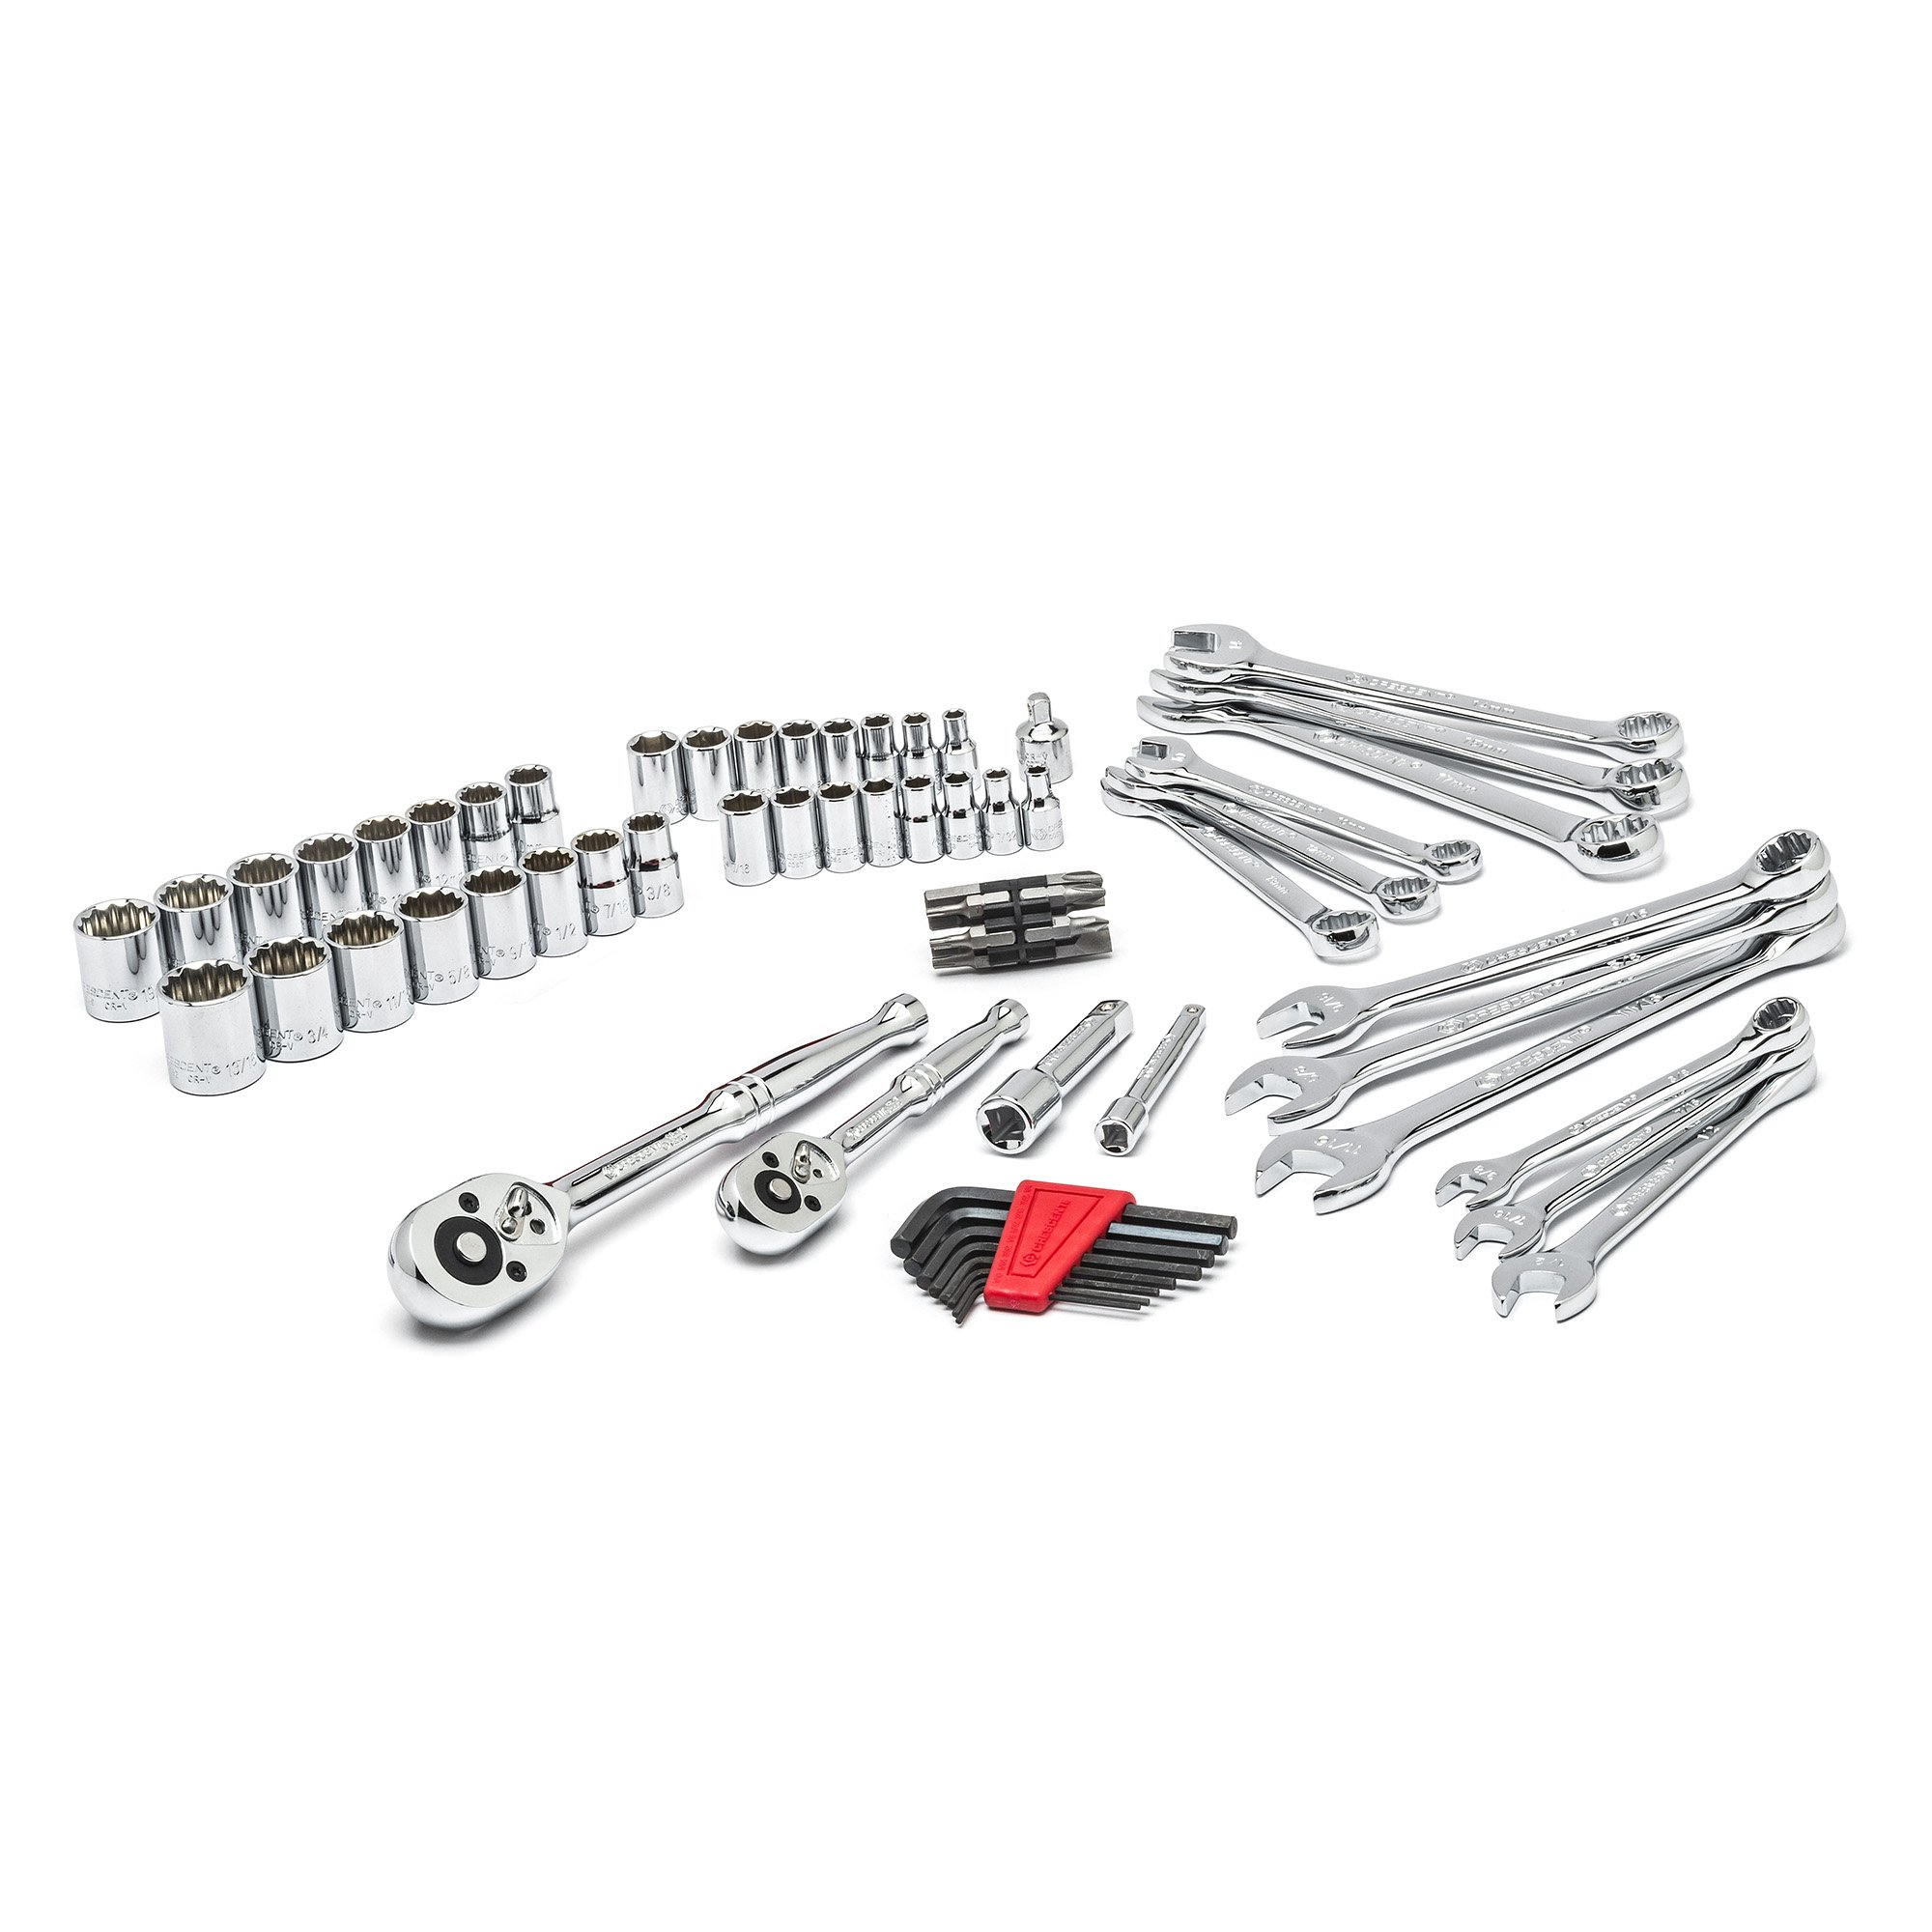 Crescent CTK70MP 70-Piece Mechanics Tool Set with Storage Case